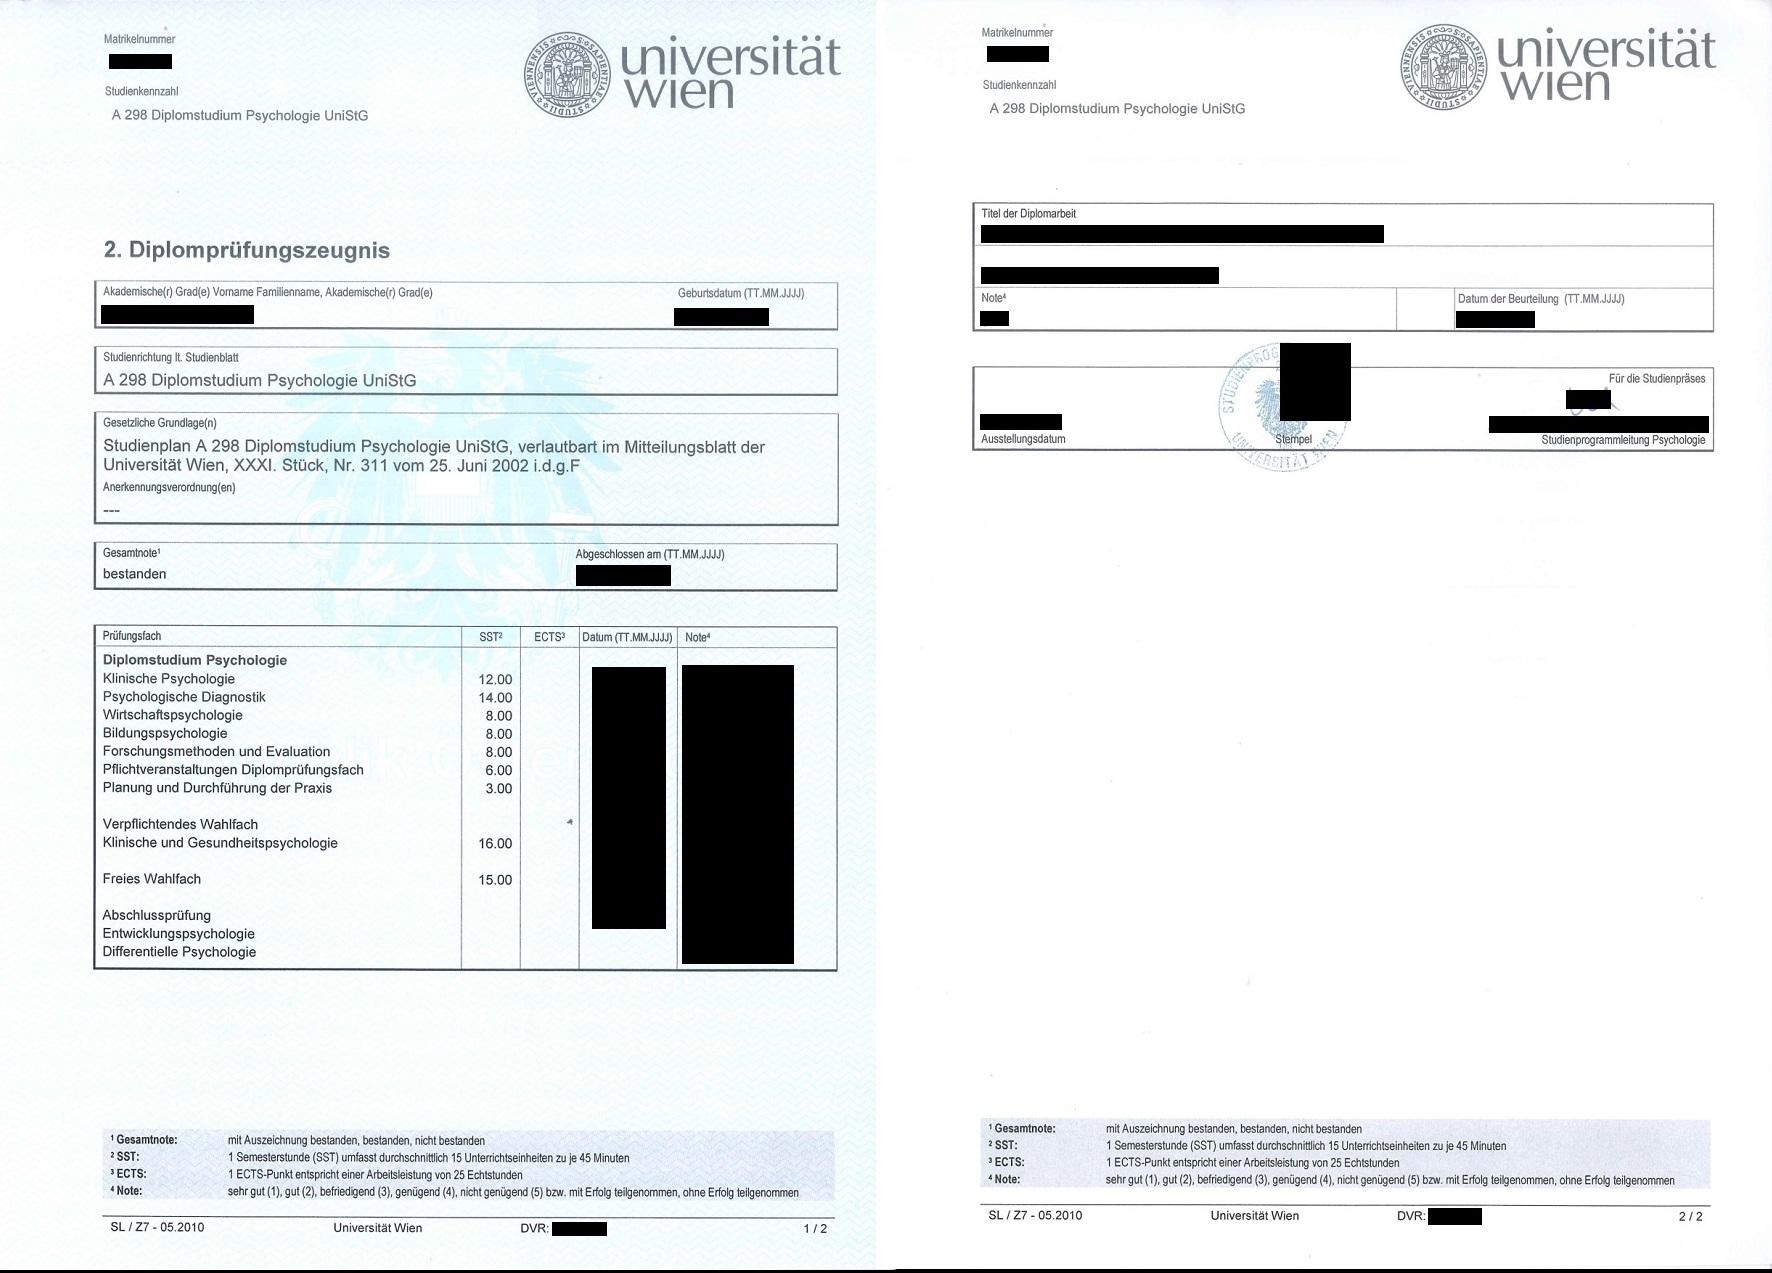 2. Diplomprüfungs- Zeugnis